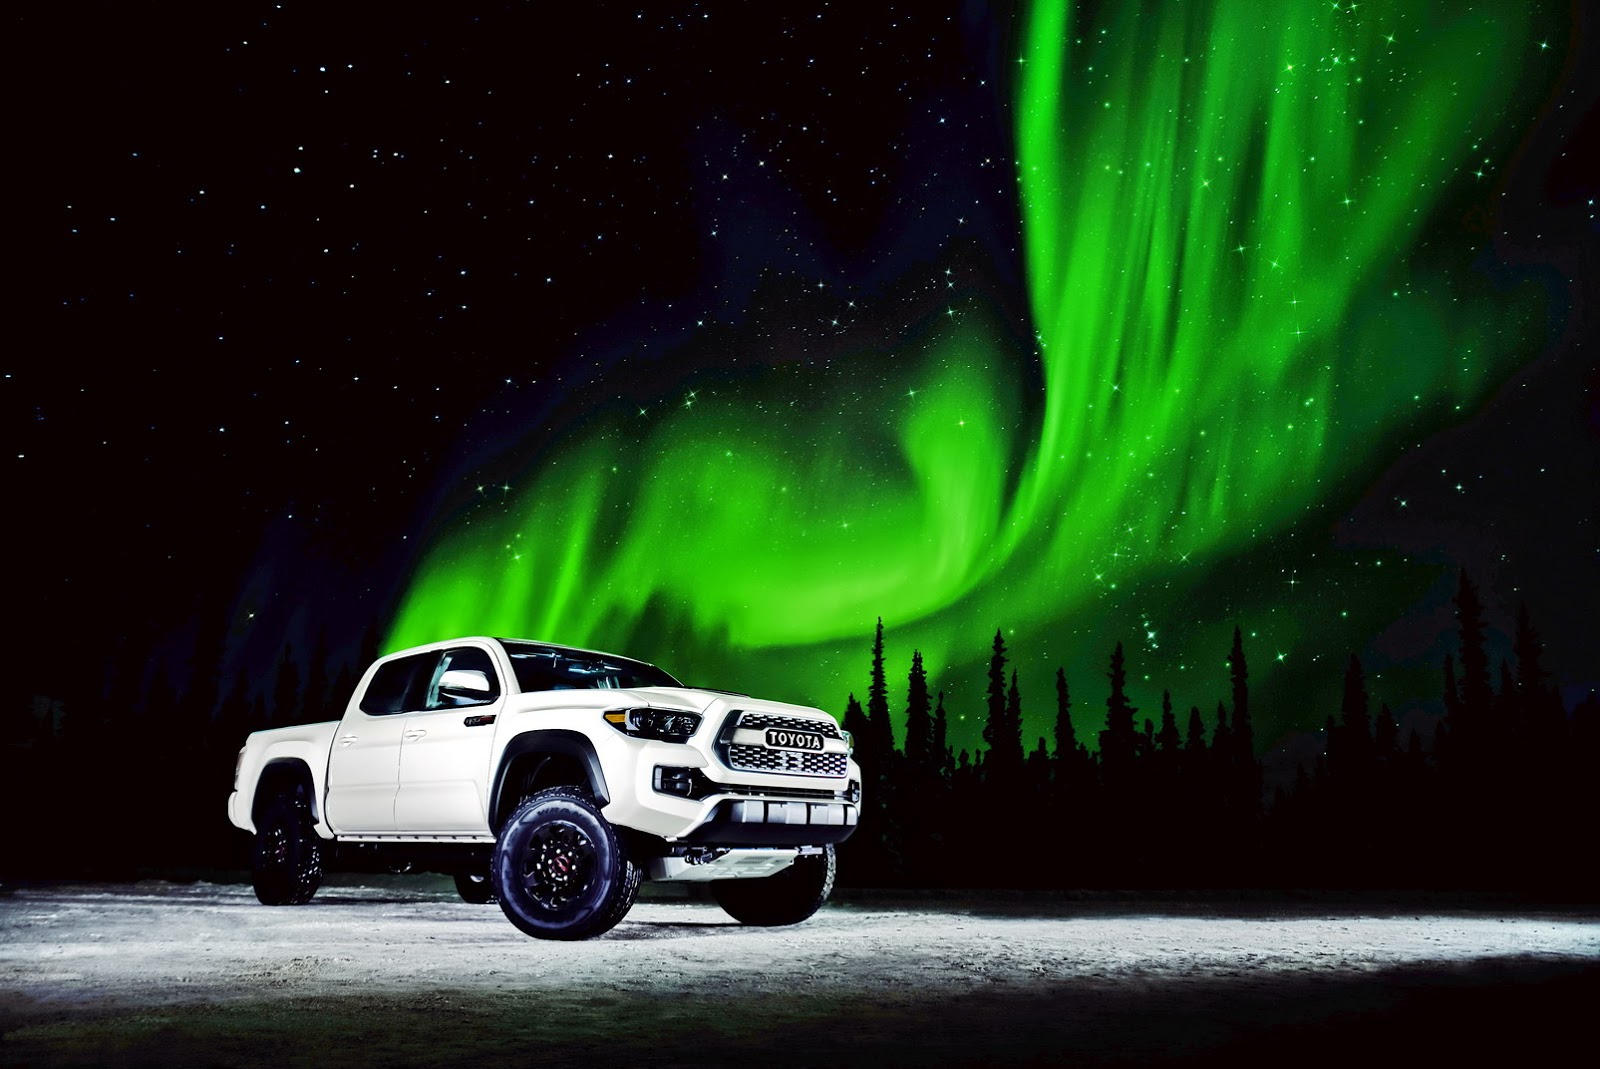 Toyota Tacoma Trd Pro Starts At It S Adventure Ready on Toyota Tacoma